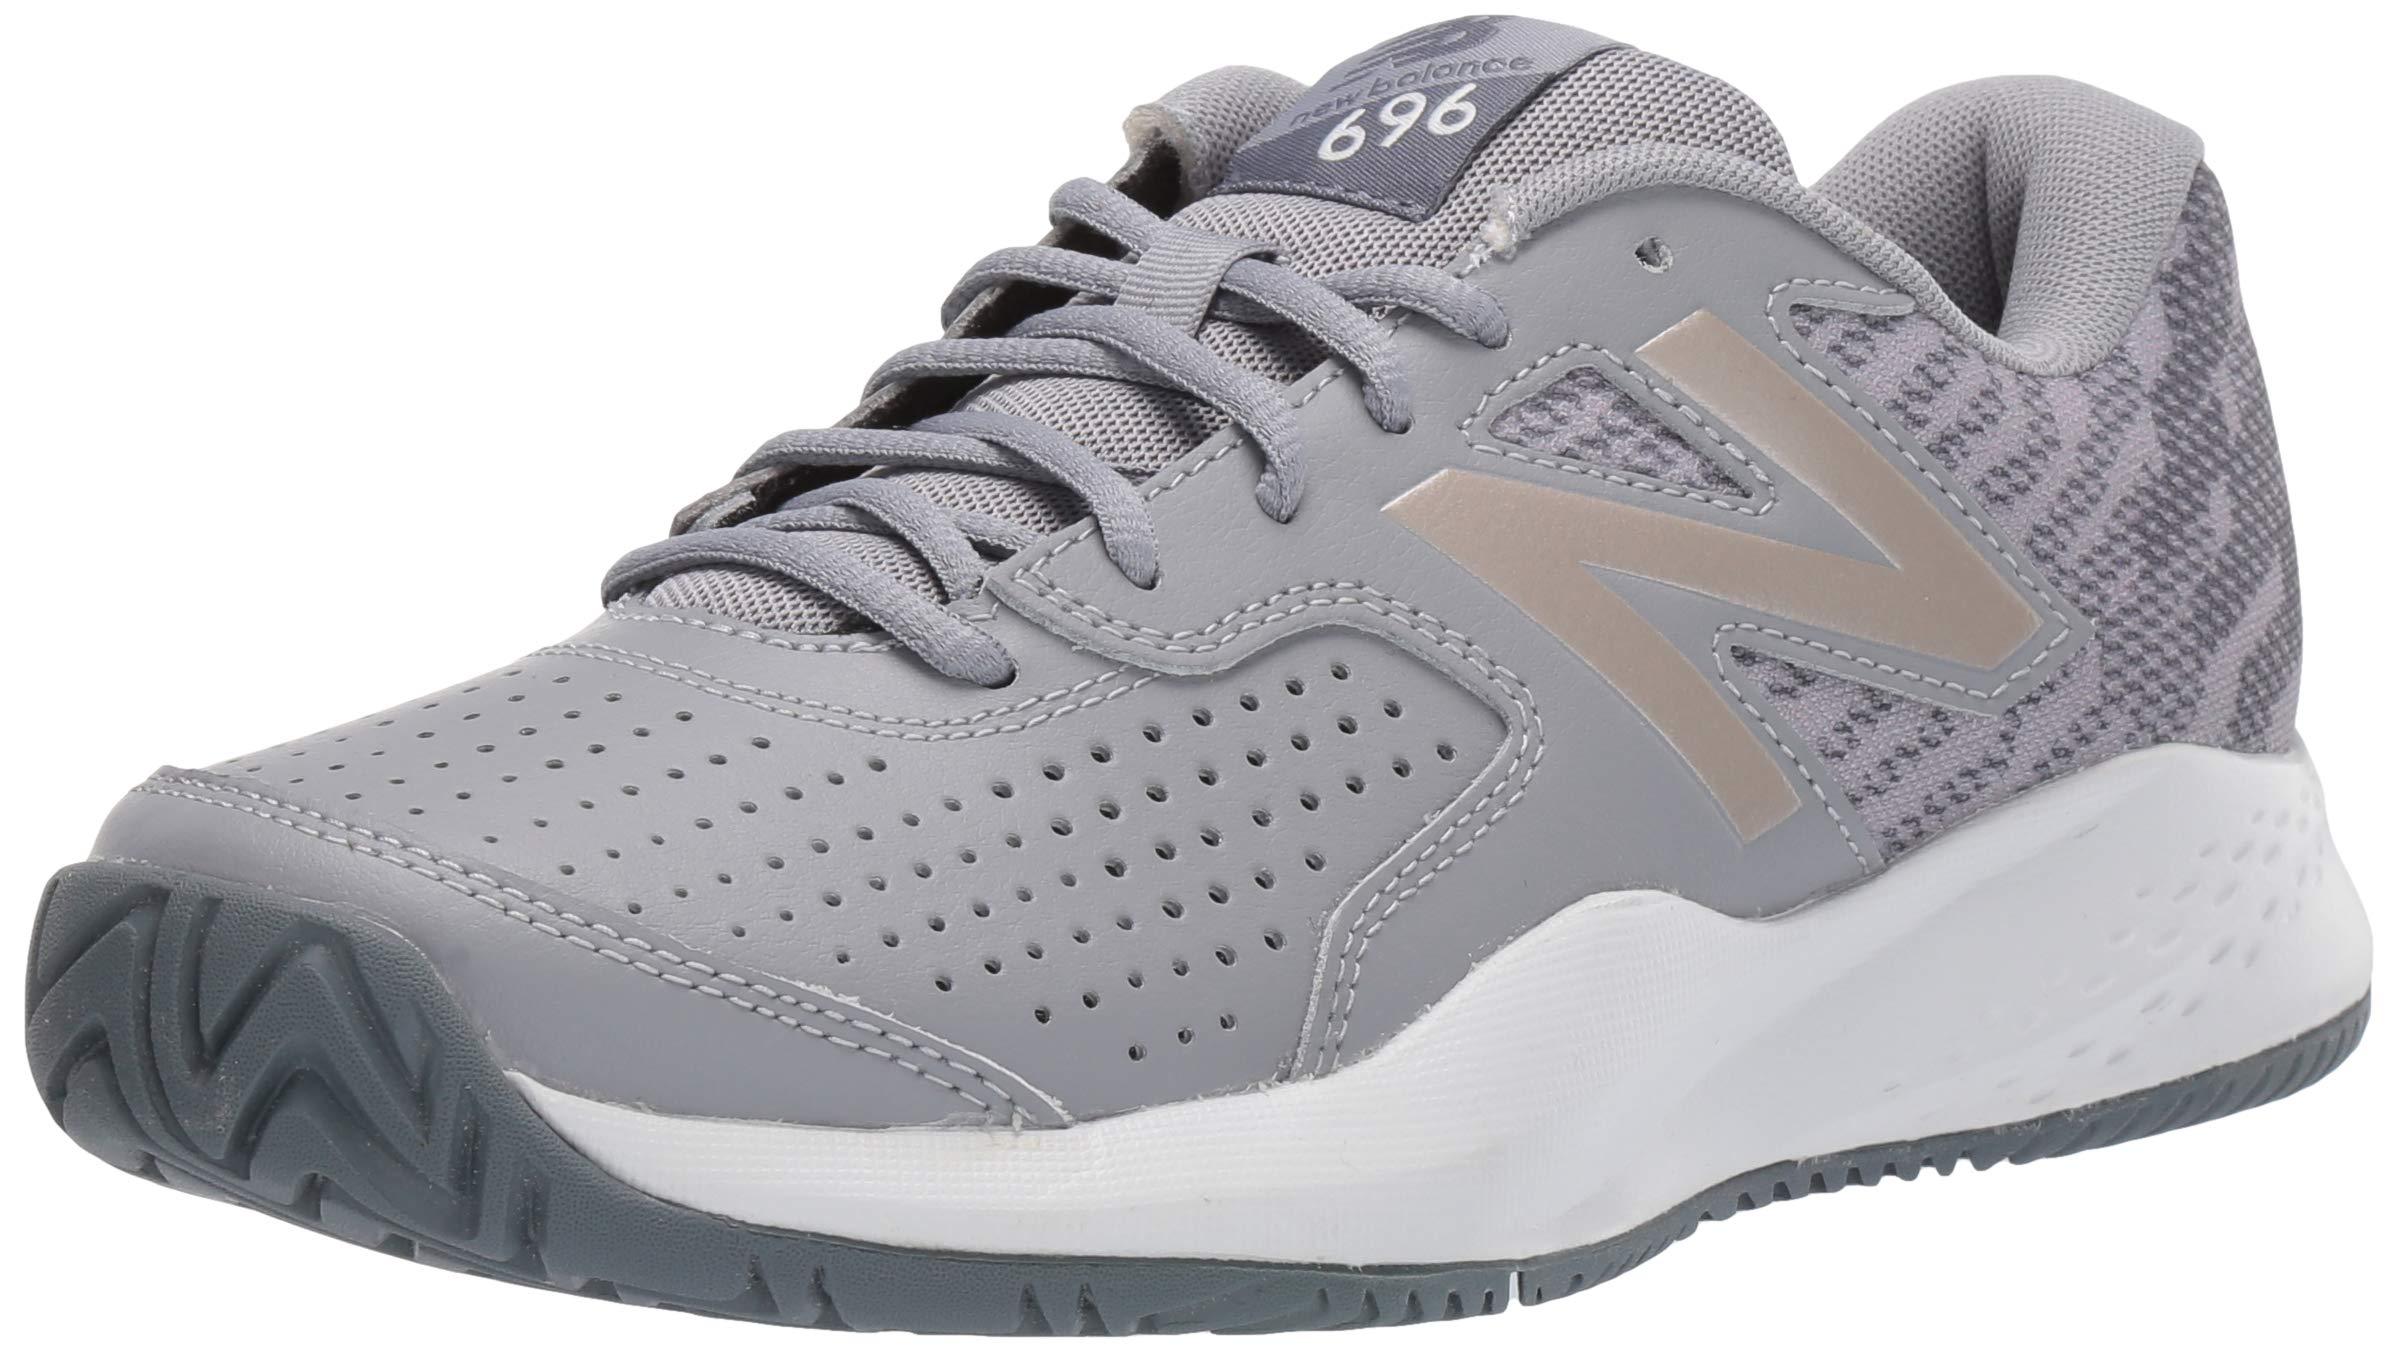 New Balance Women's 696v3 Hard Court Tennis Shoe, STEEL/CHAMPAGNE, 9 M US by New Balance